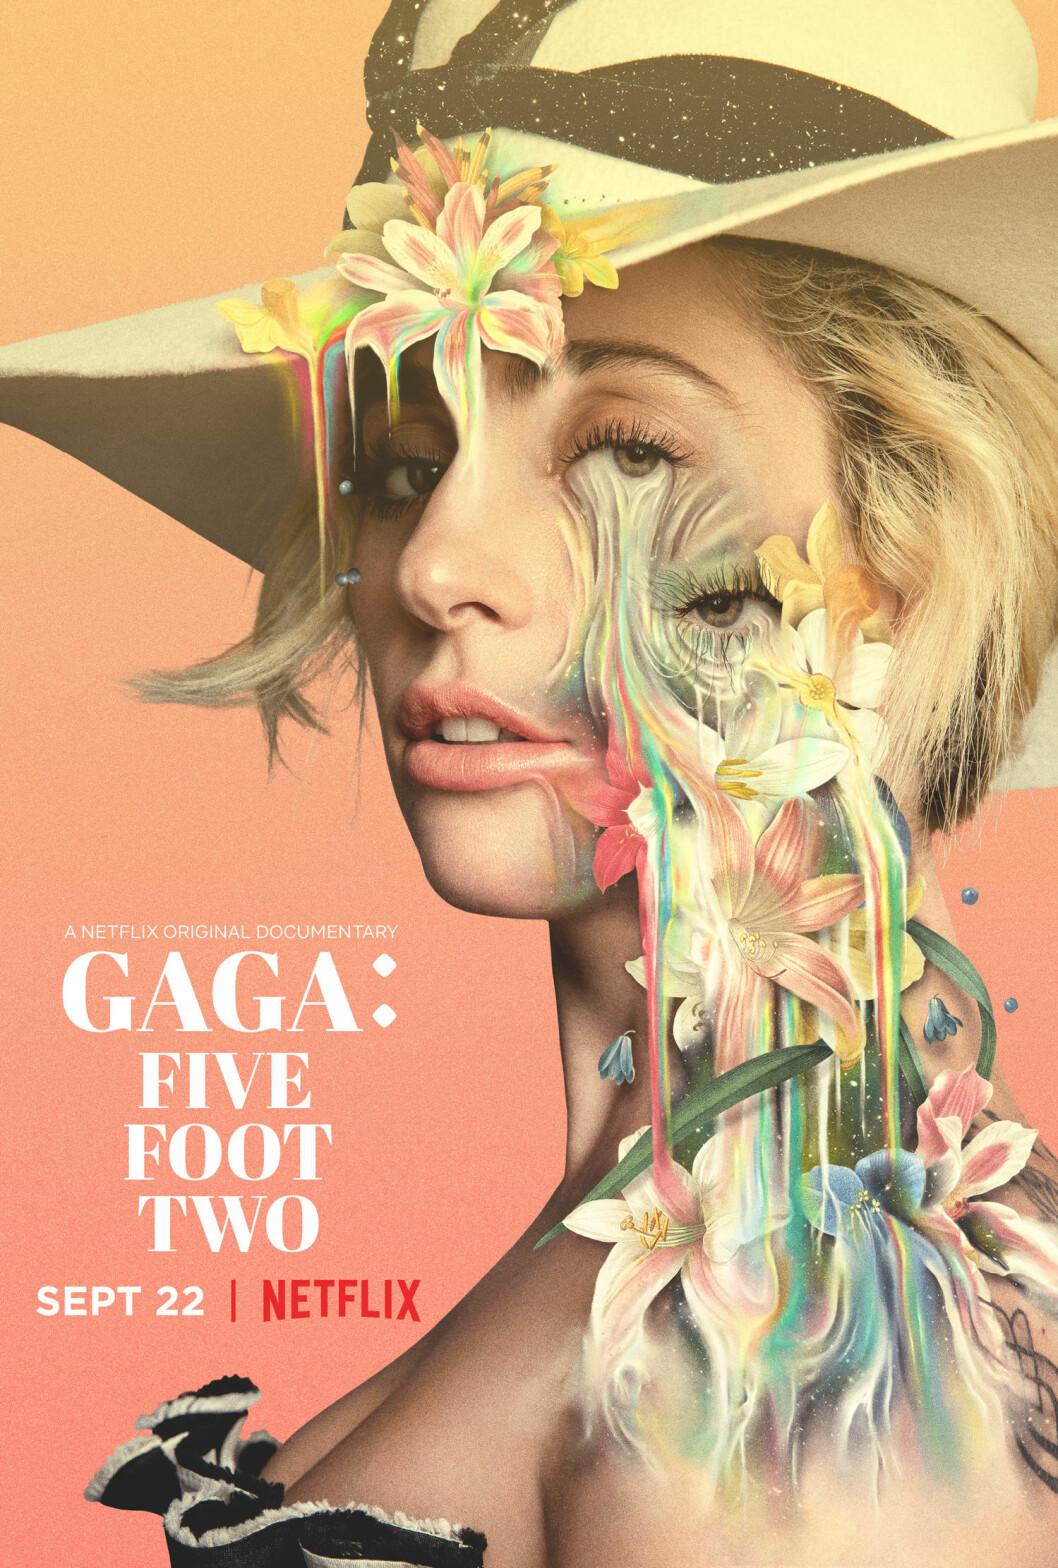 Dokumentären Gaga: Five foot two